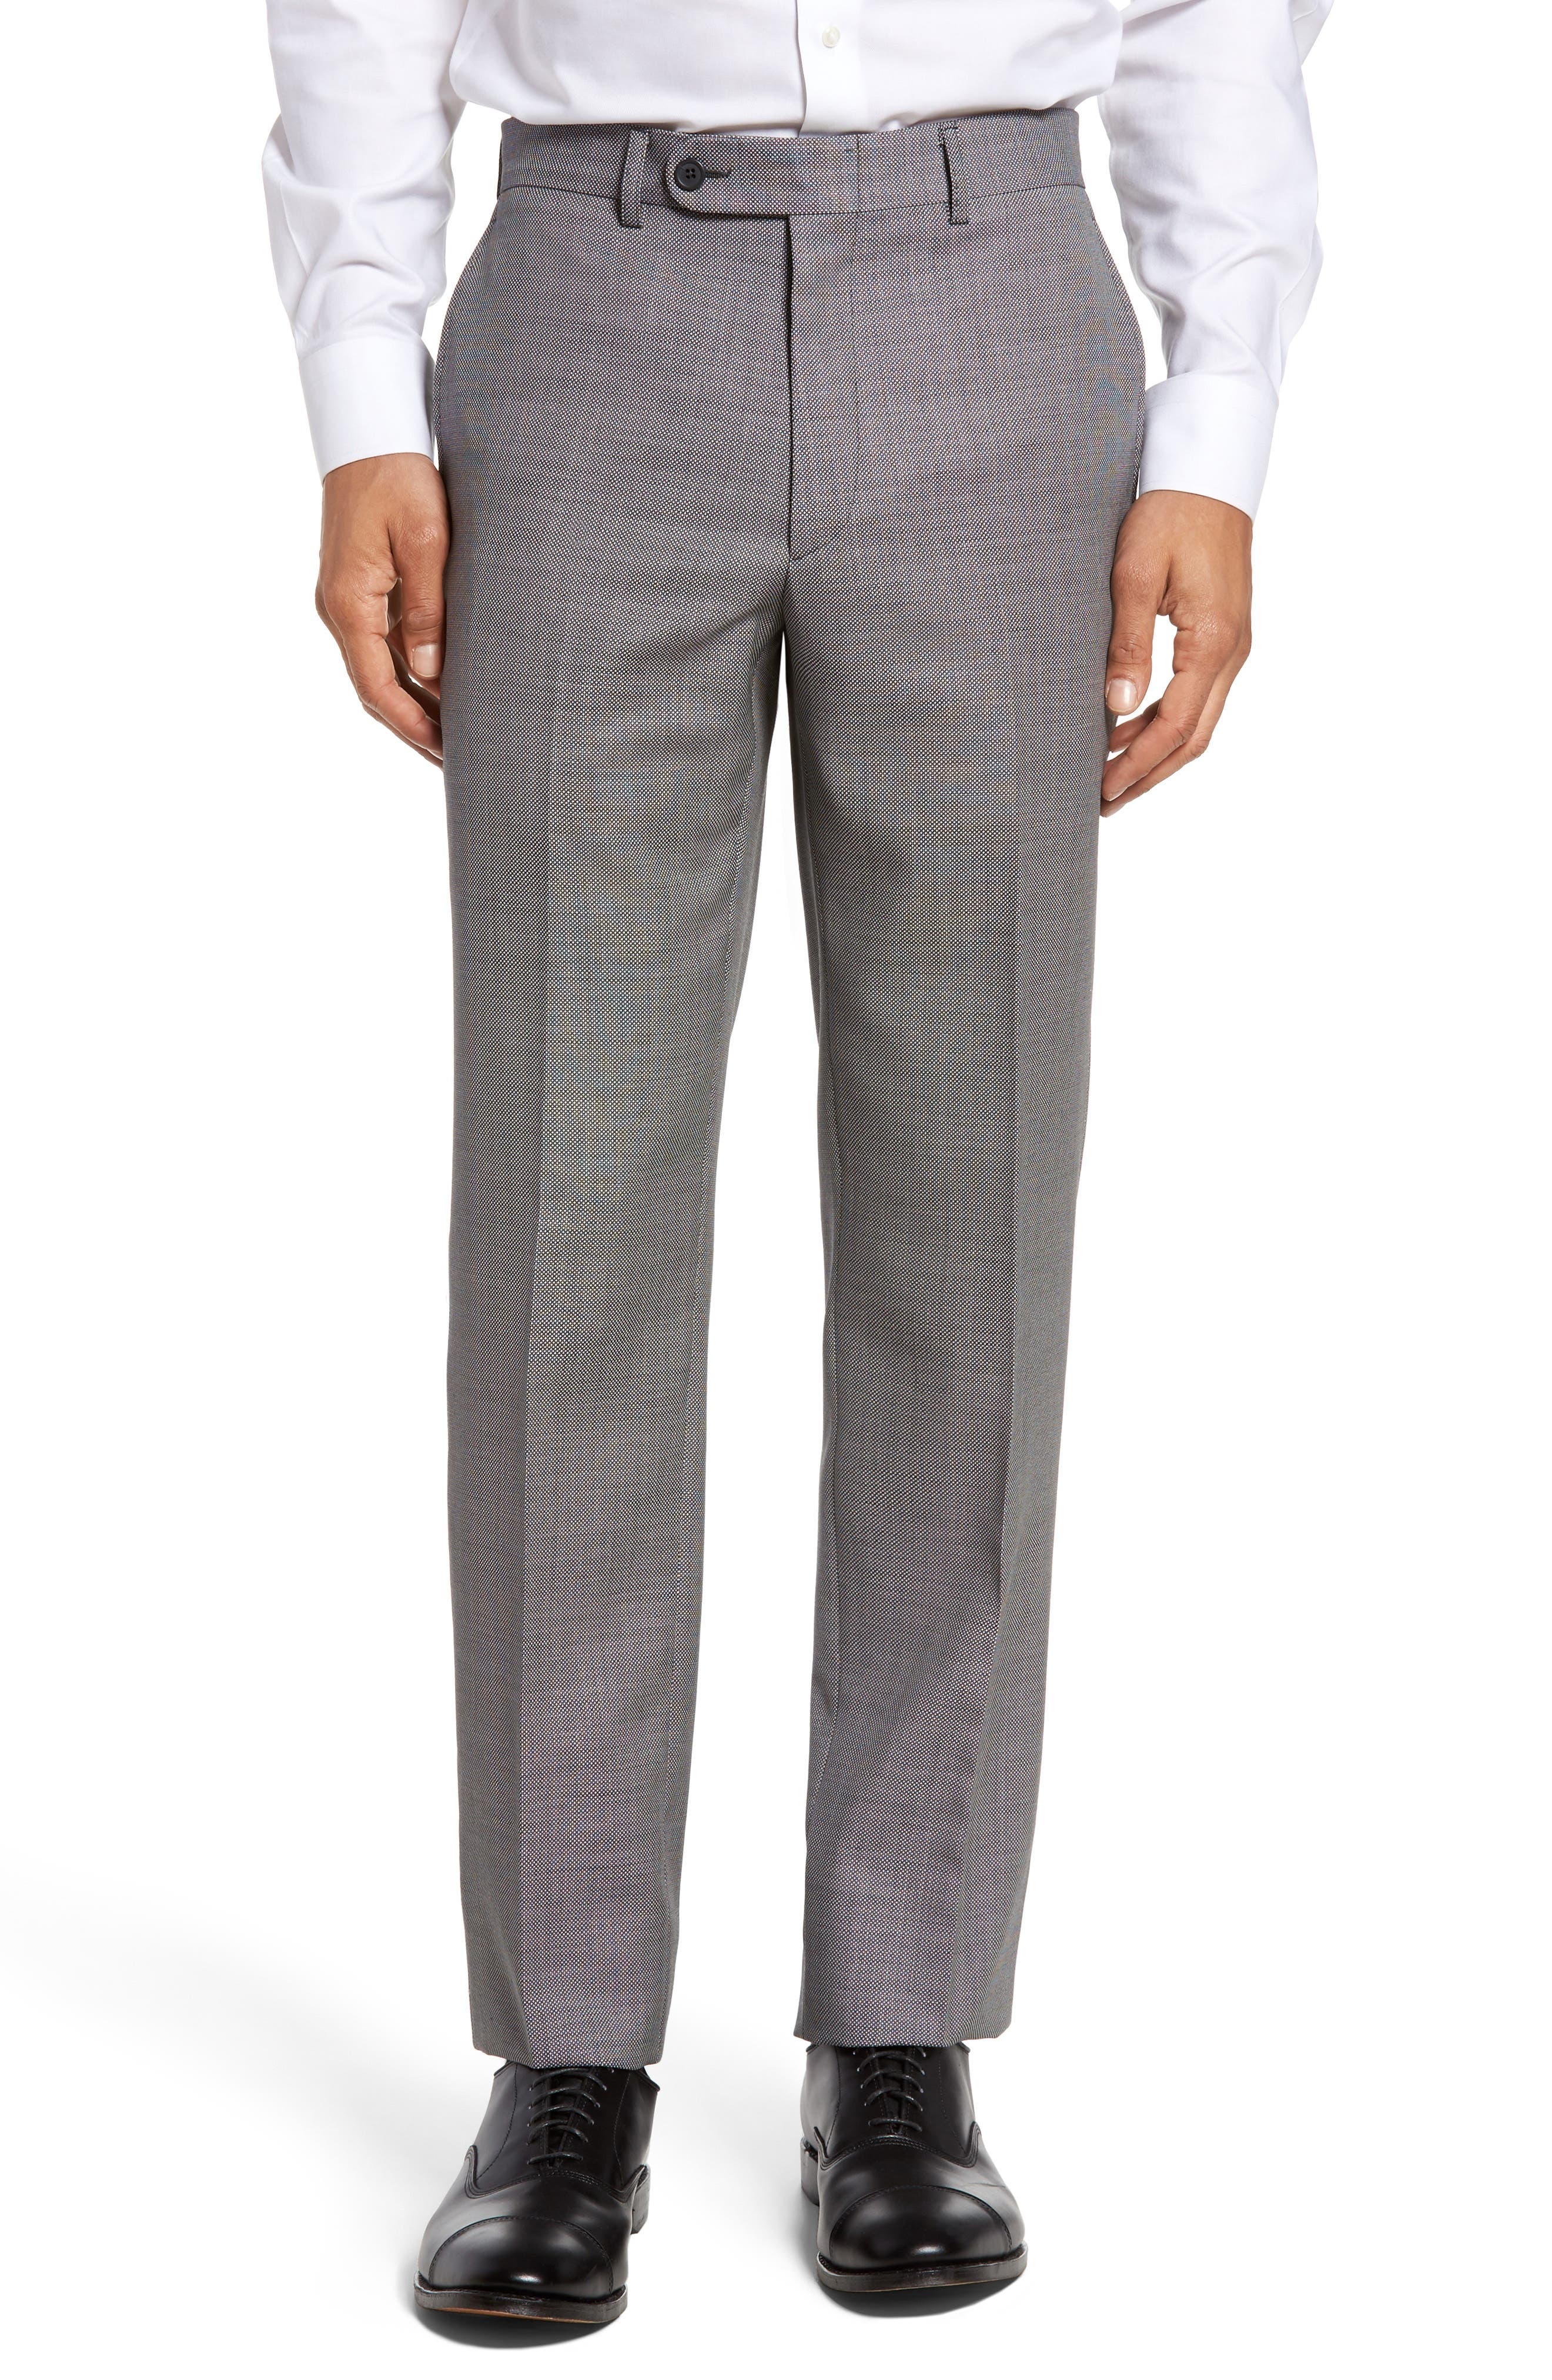 Bensol Tic Wool Trousers